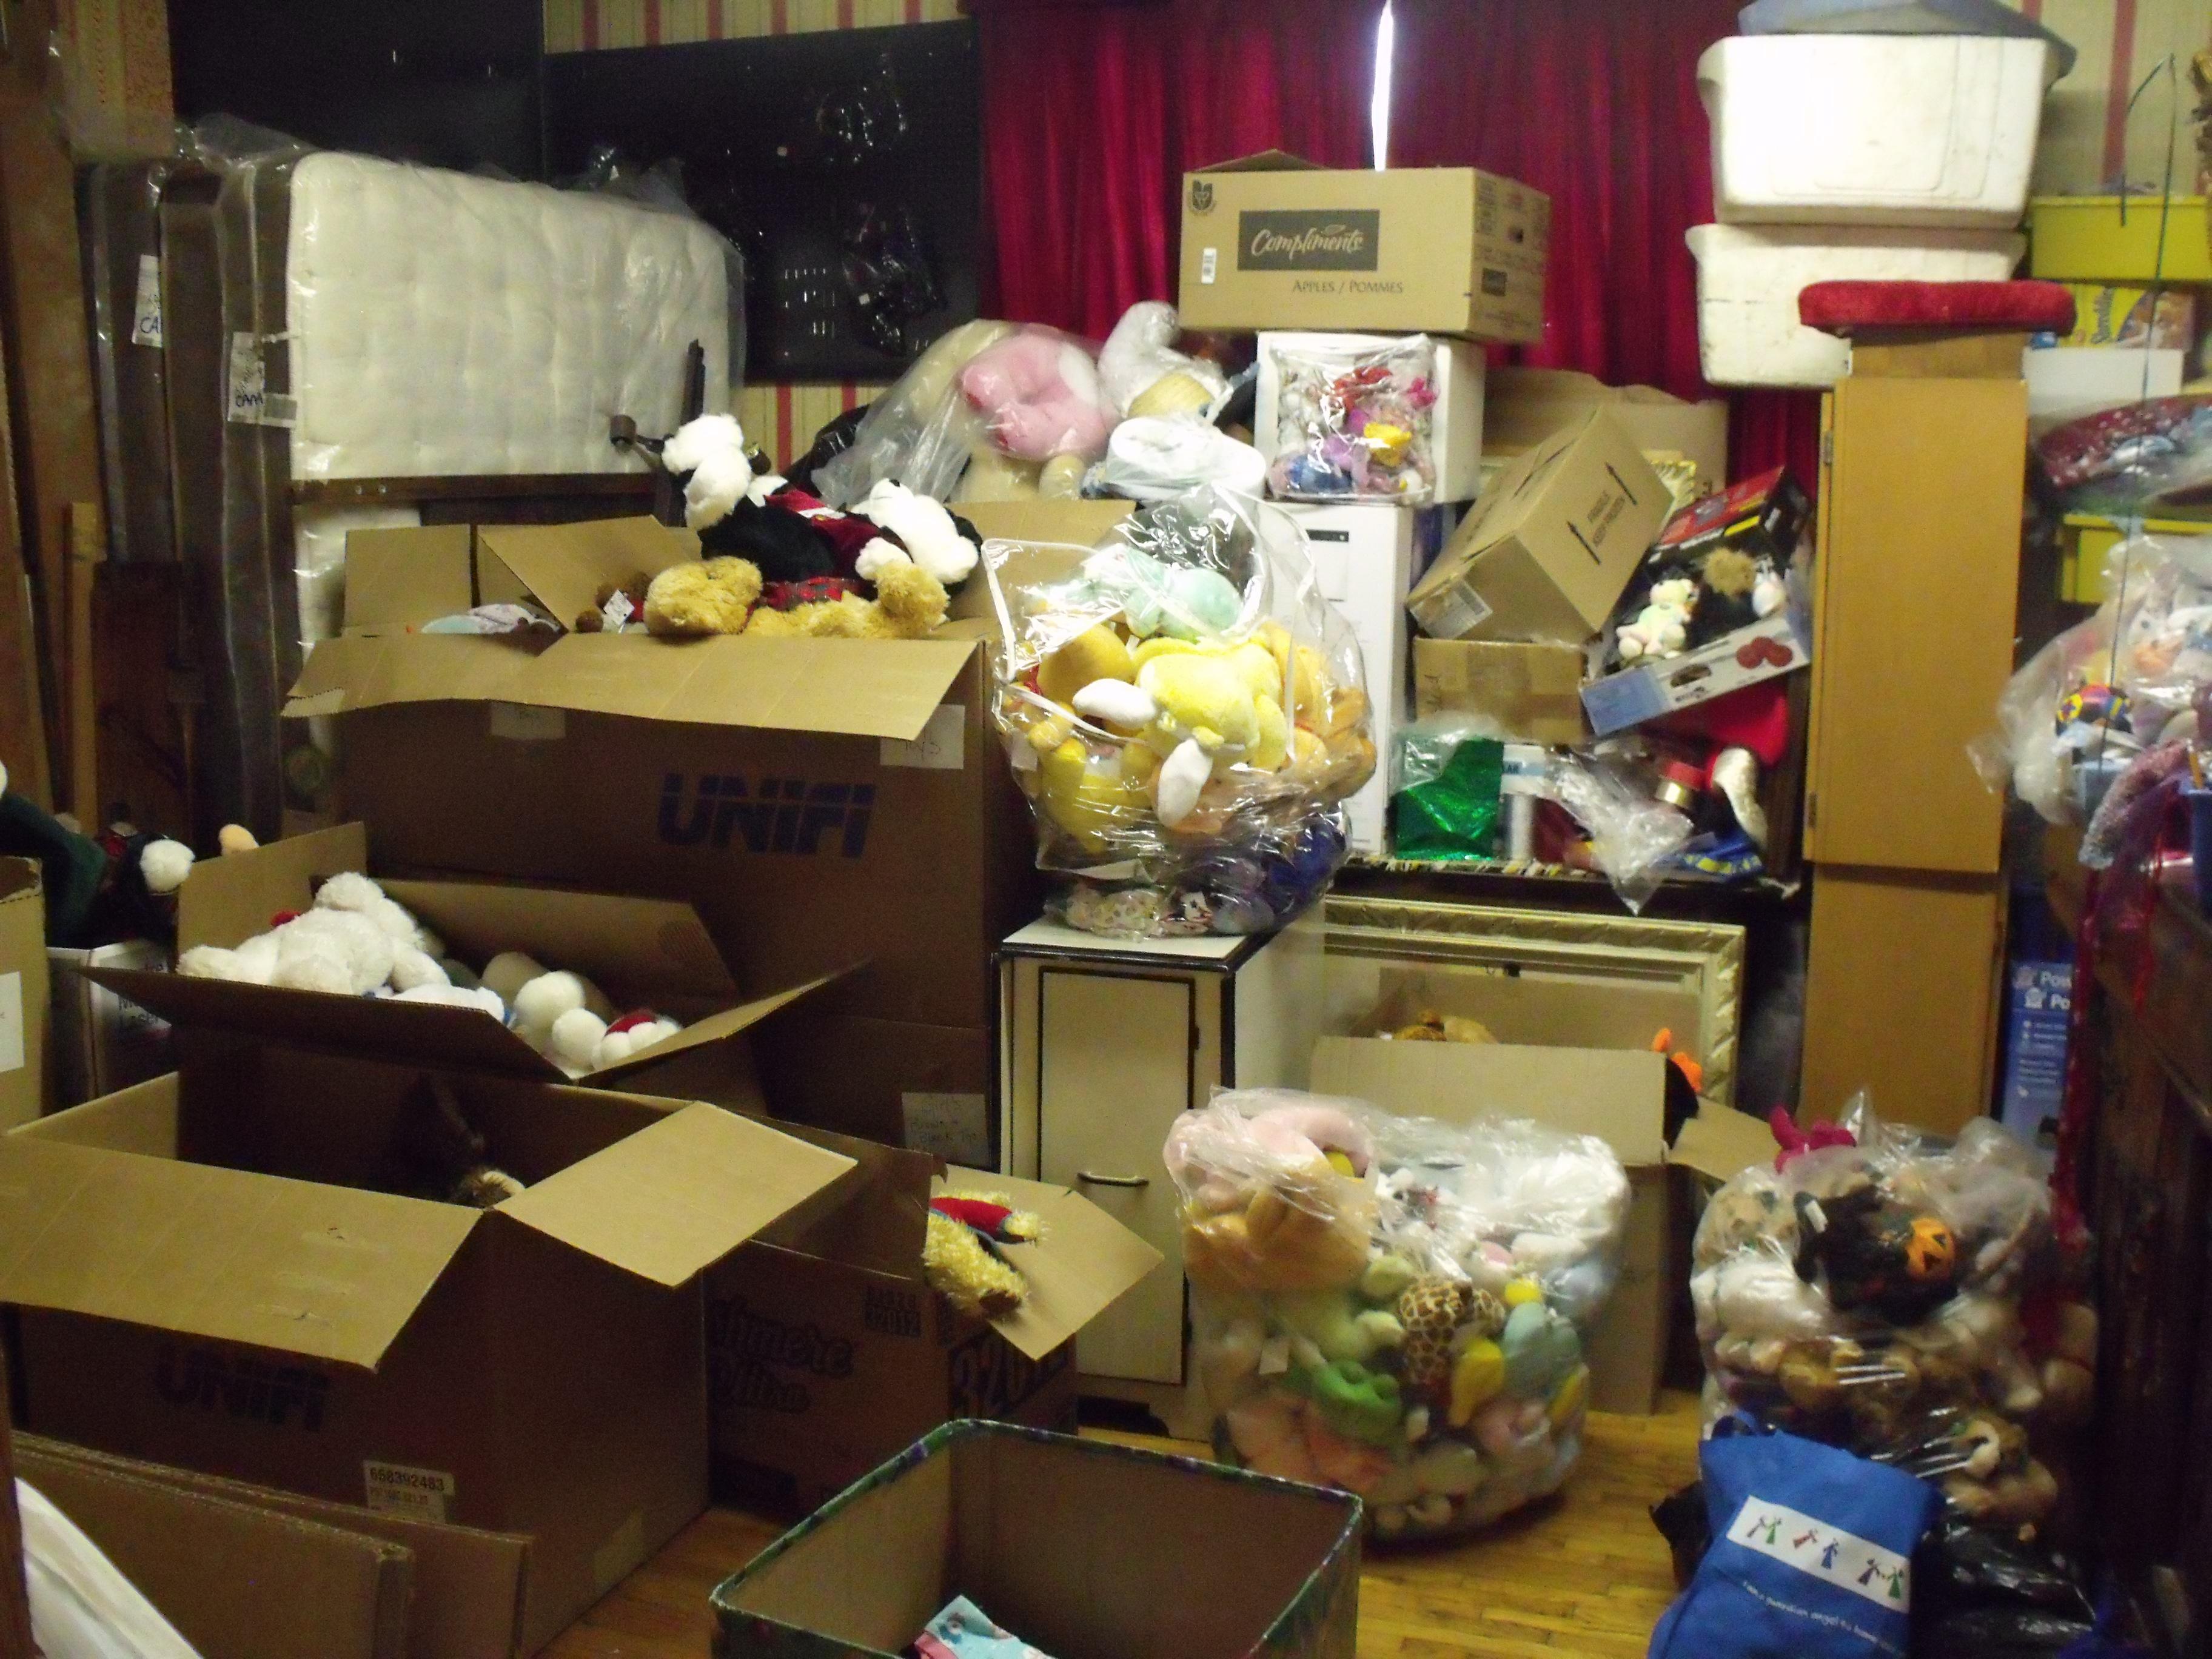 Messy-toy-room.jpg